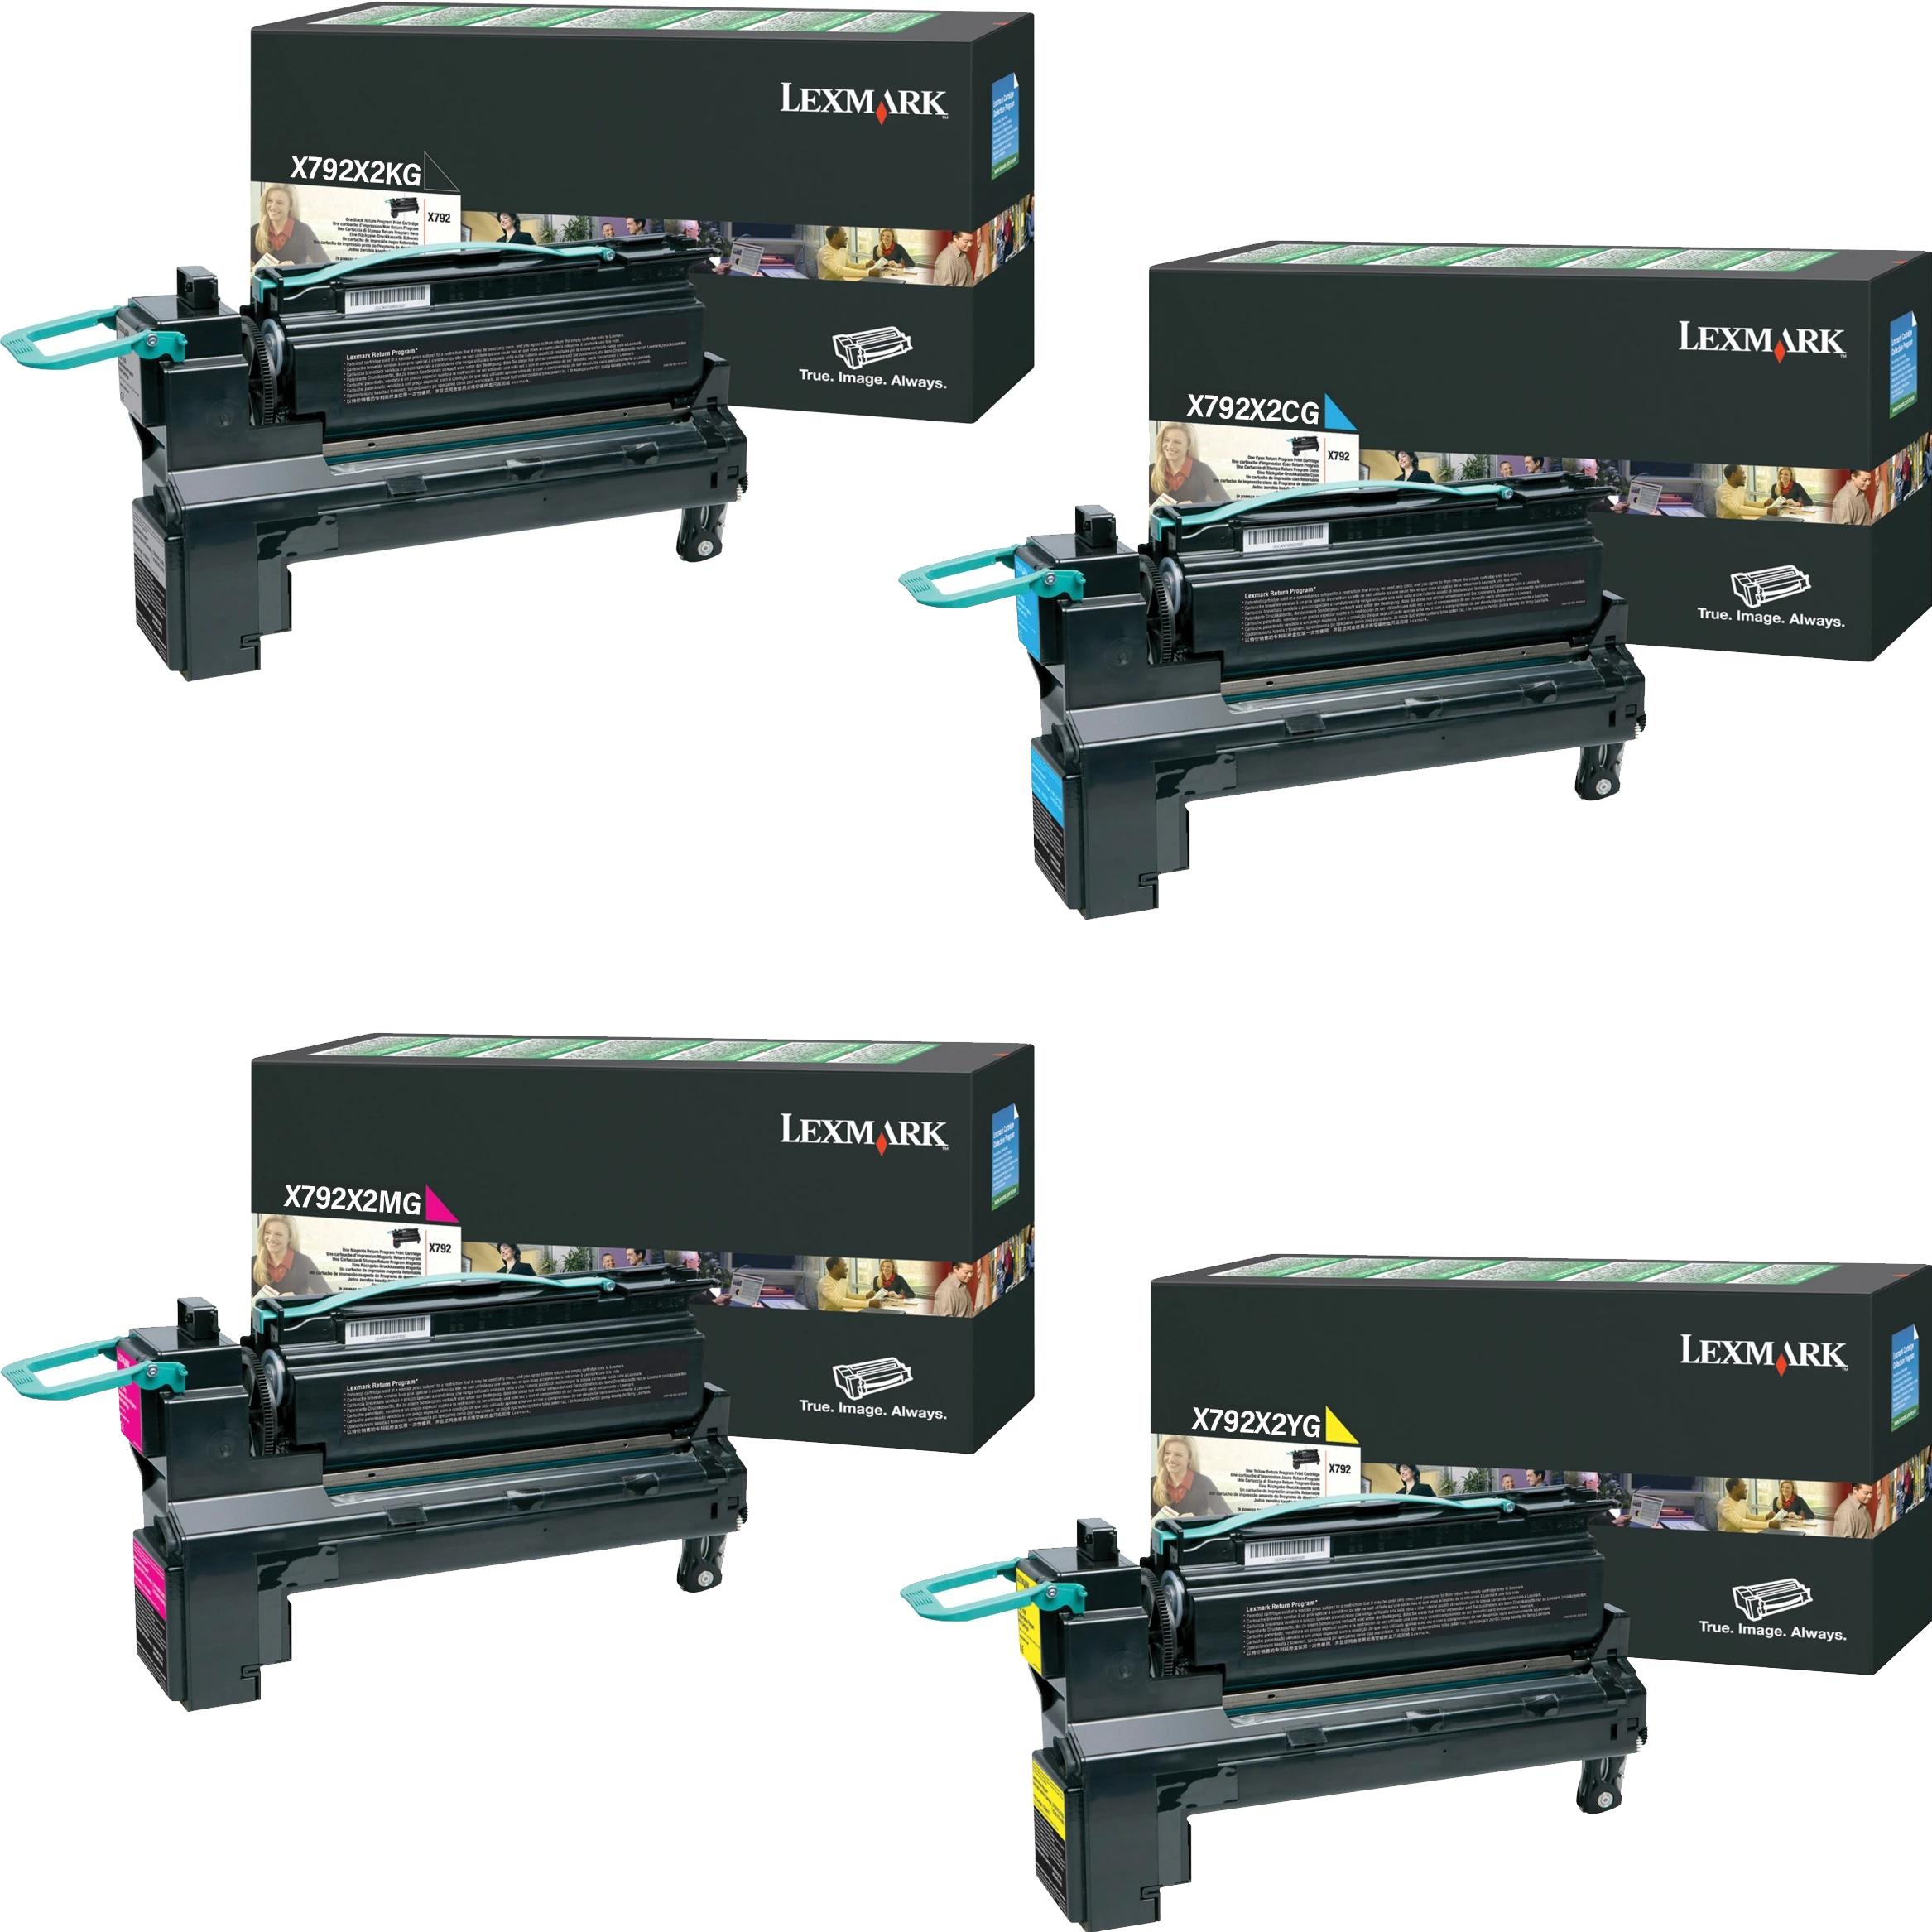 Lexmark X792X2 Set   X792X2CG X792X2KG X792X2MG X792X2YG   Original Lexmark Extra High-Yield Toner Cartridges – Black, Cyan, Magenta, Yellow